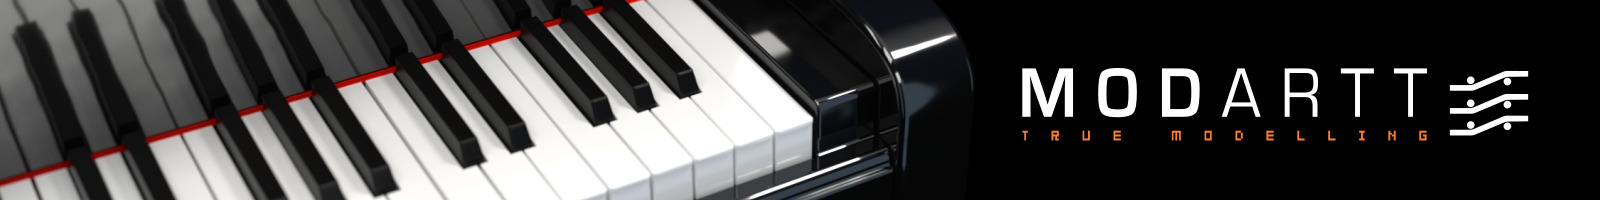 Vst piano free